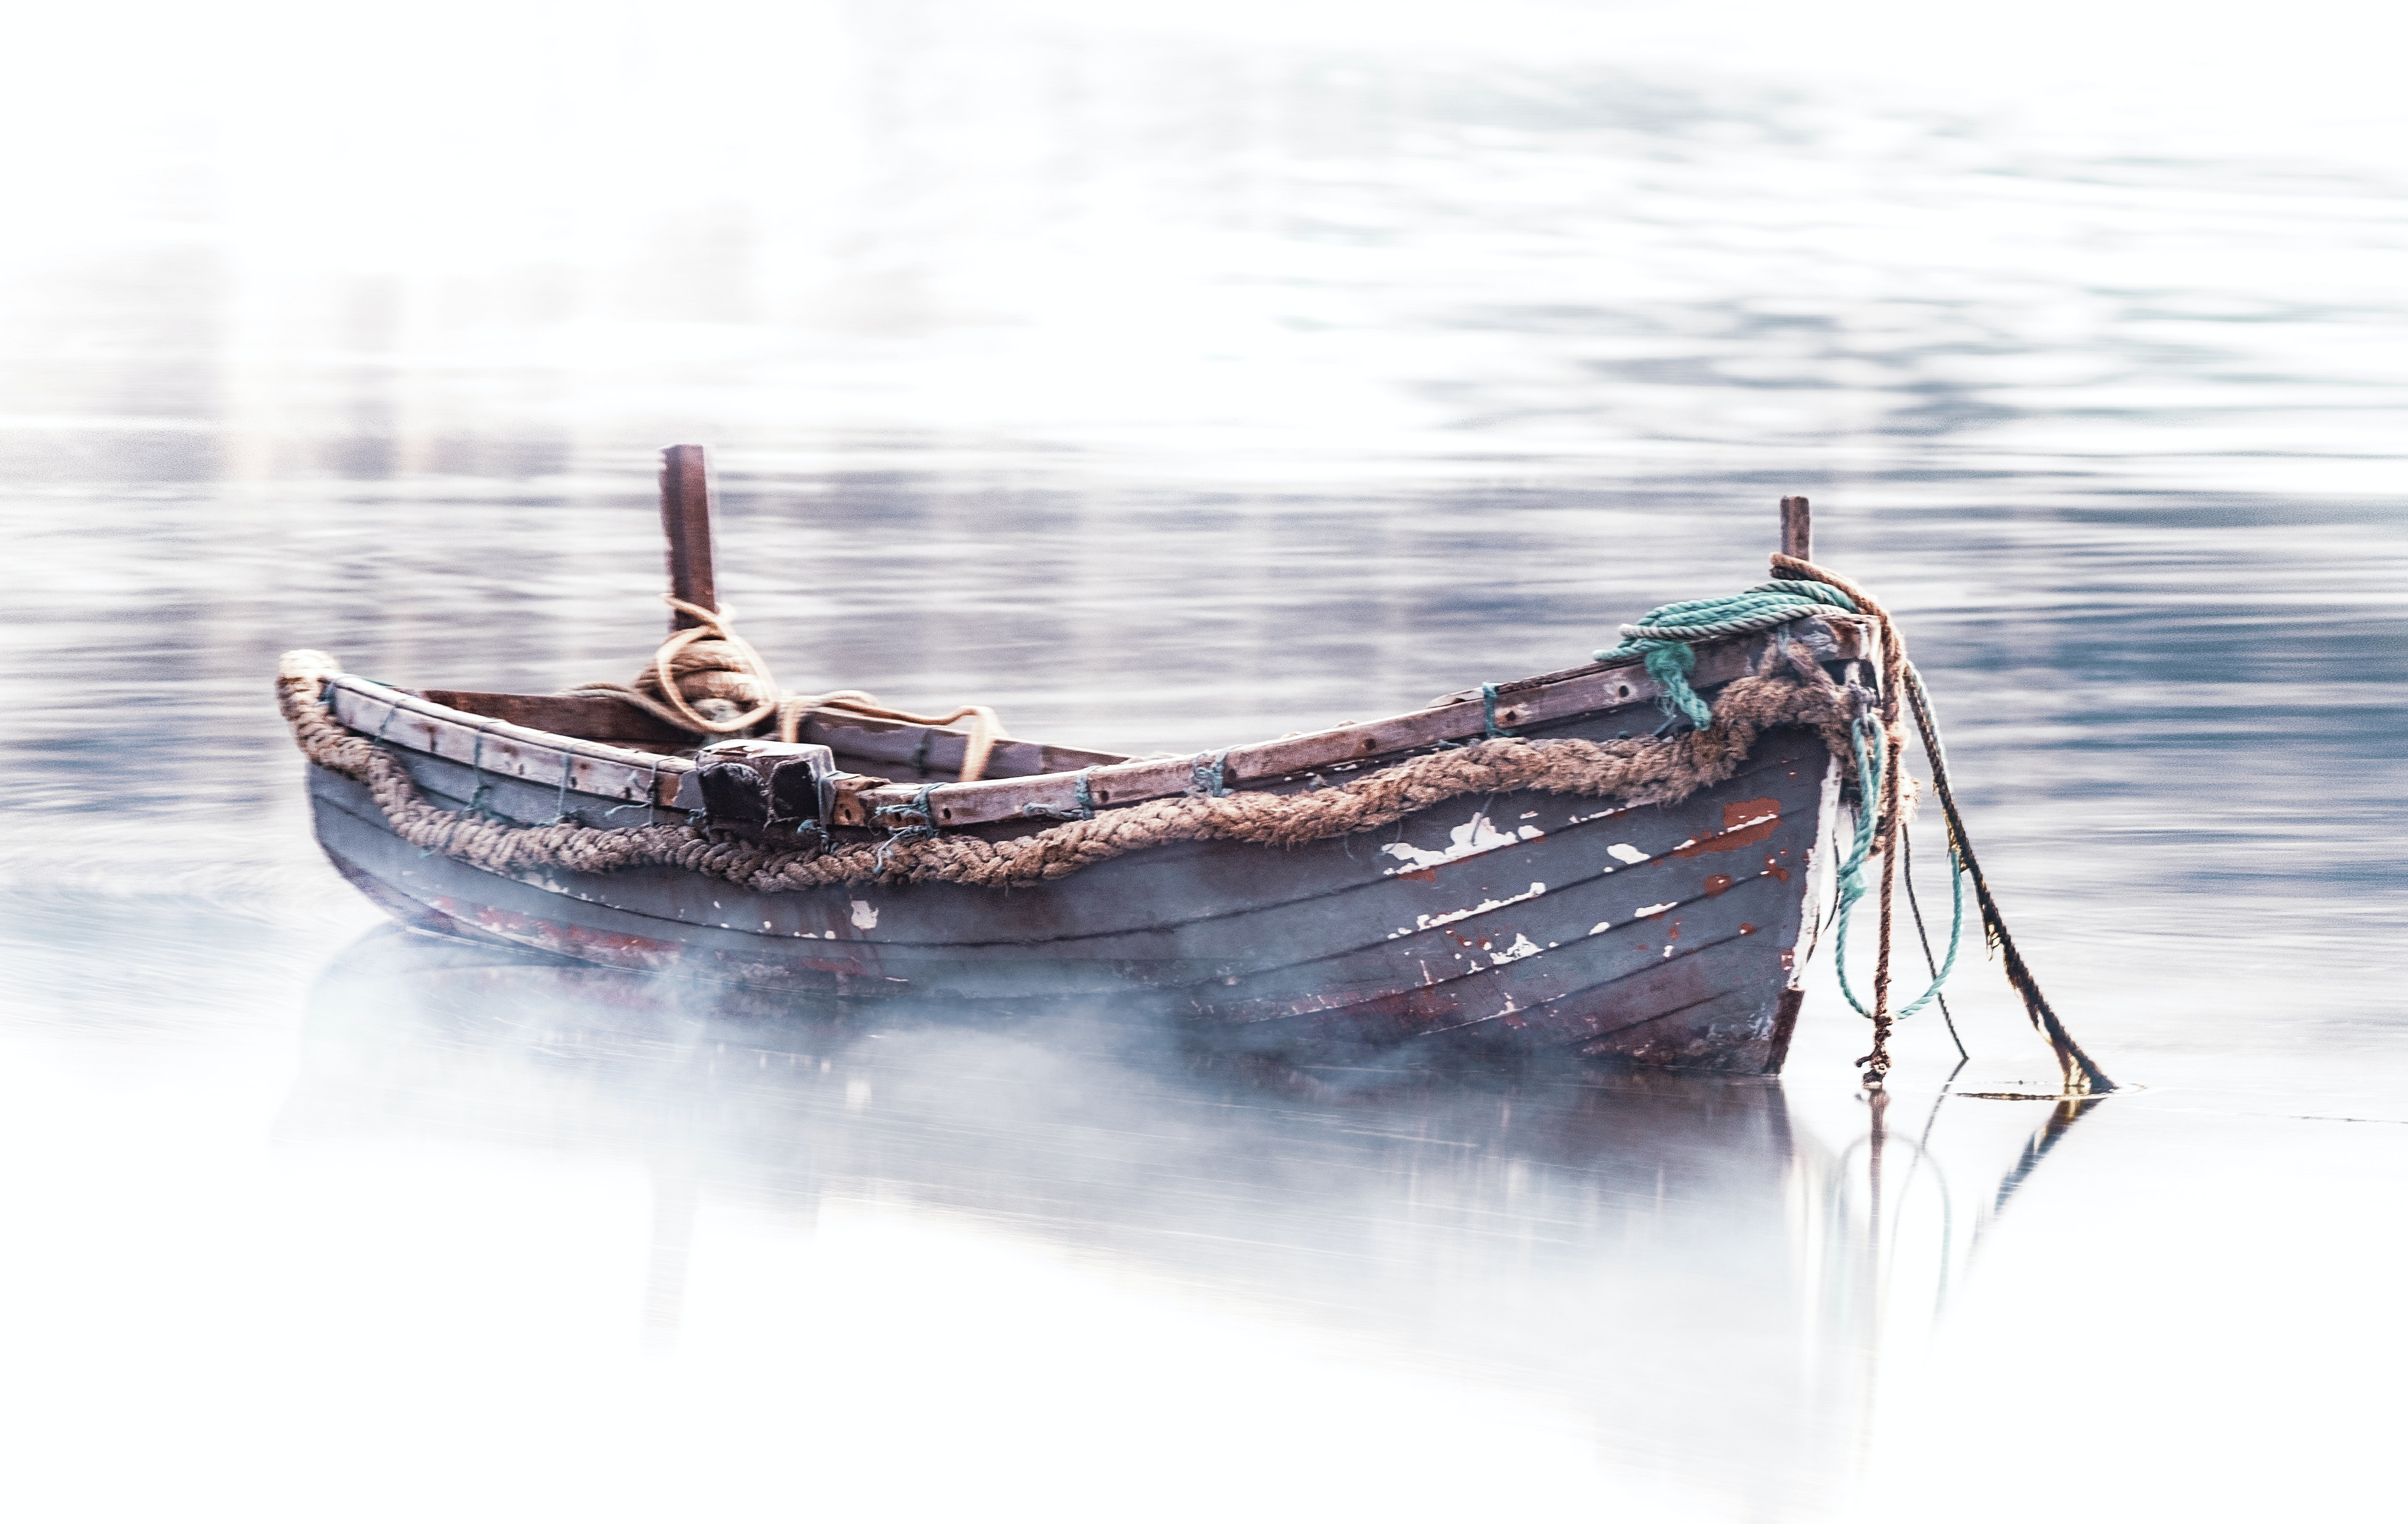 Matthew 14:22-33, Sermon, Ghosts, Jesus Walks On Water, Peter Walks On Water